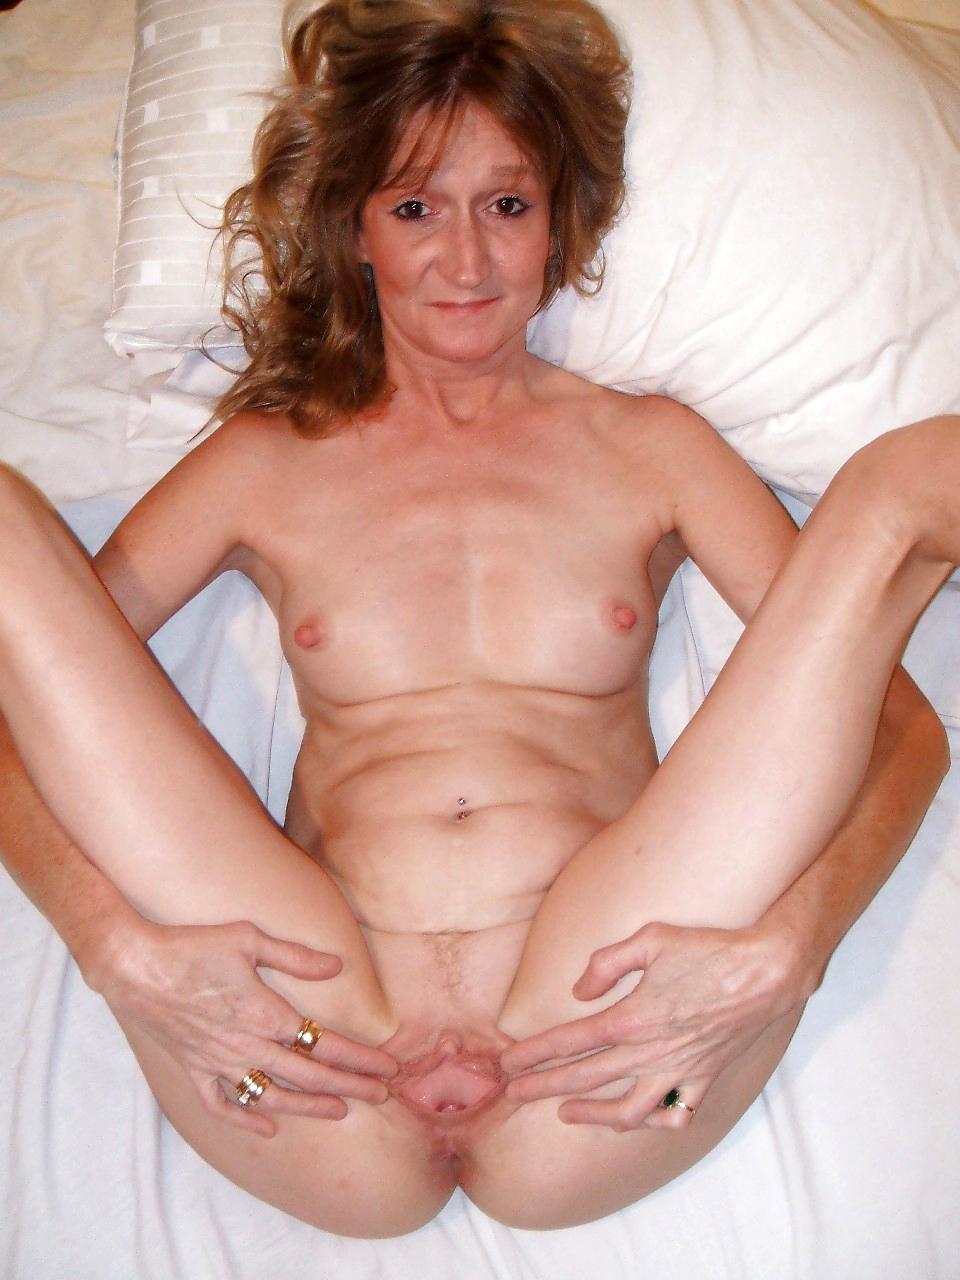 Pussy skinny granny Old Women